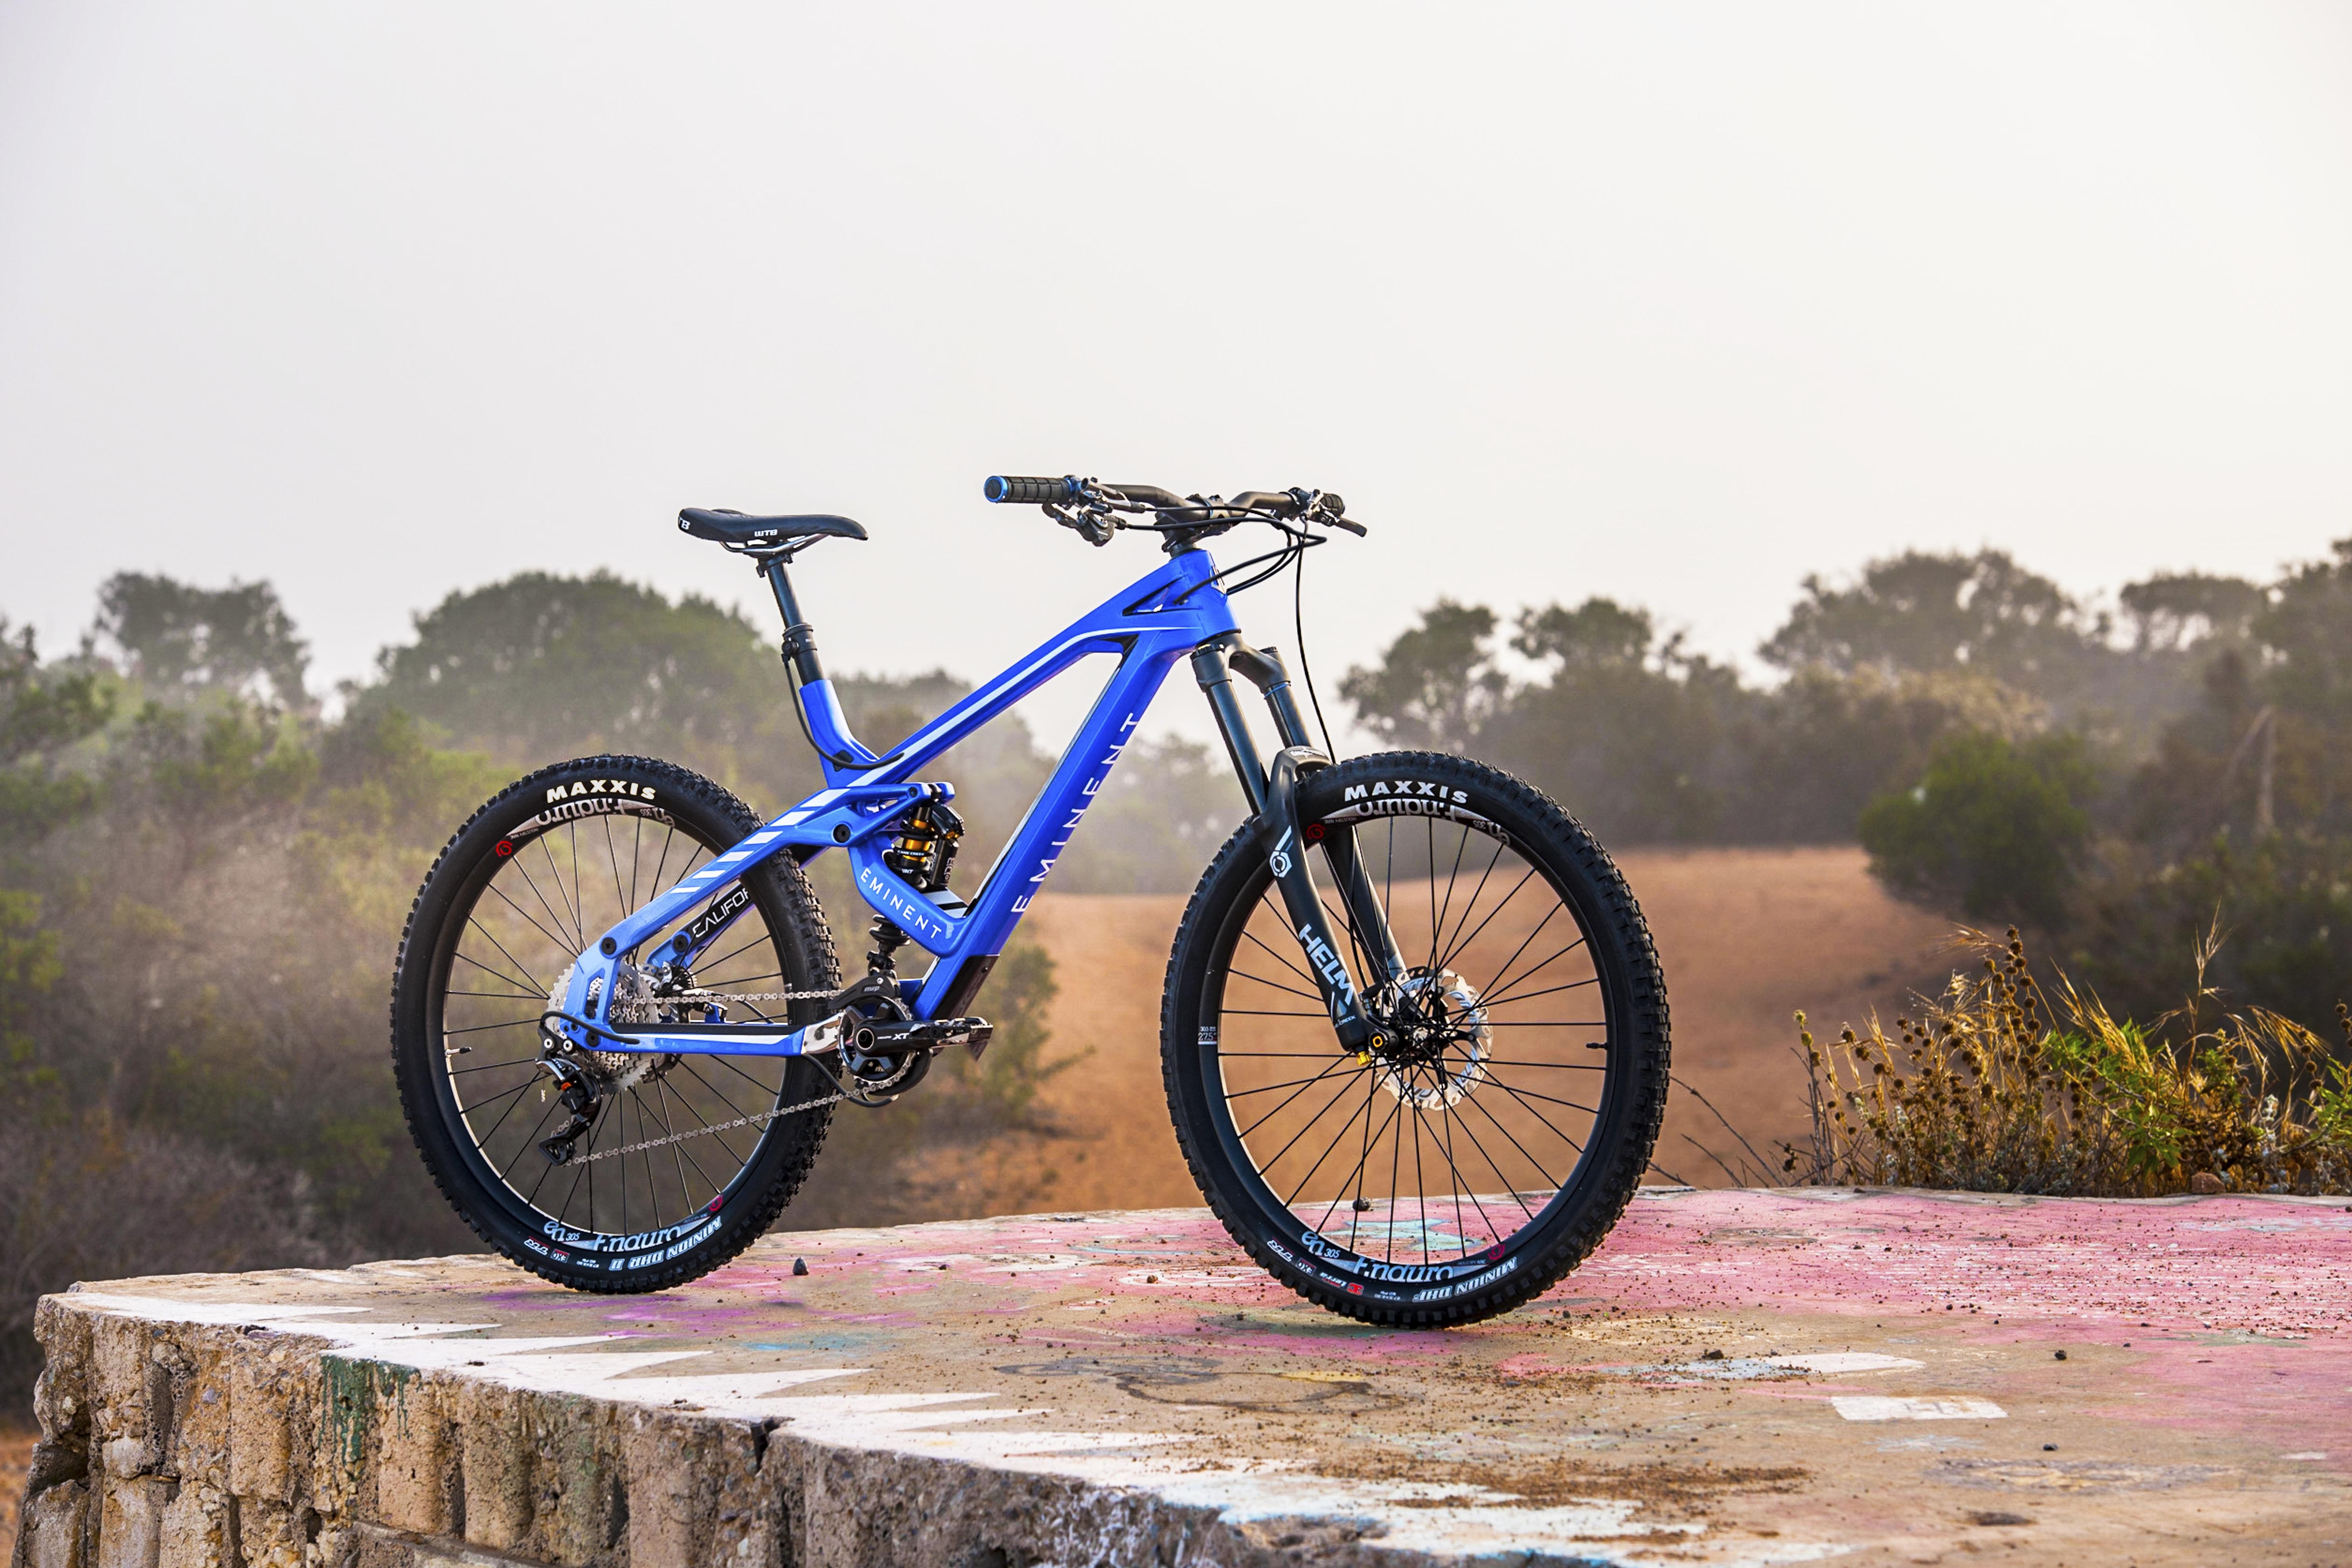 New Company New Bike The Eminent Haste Singletracks